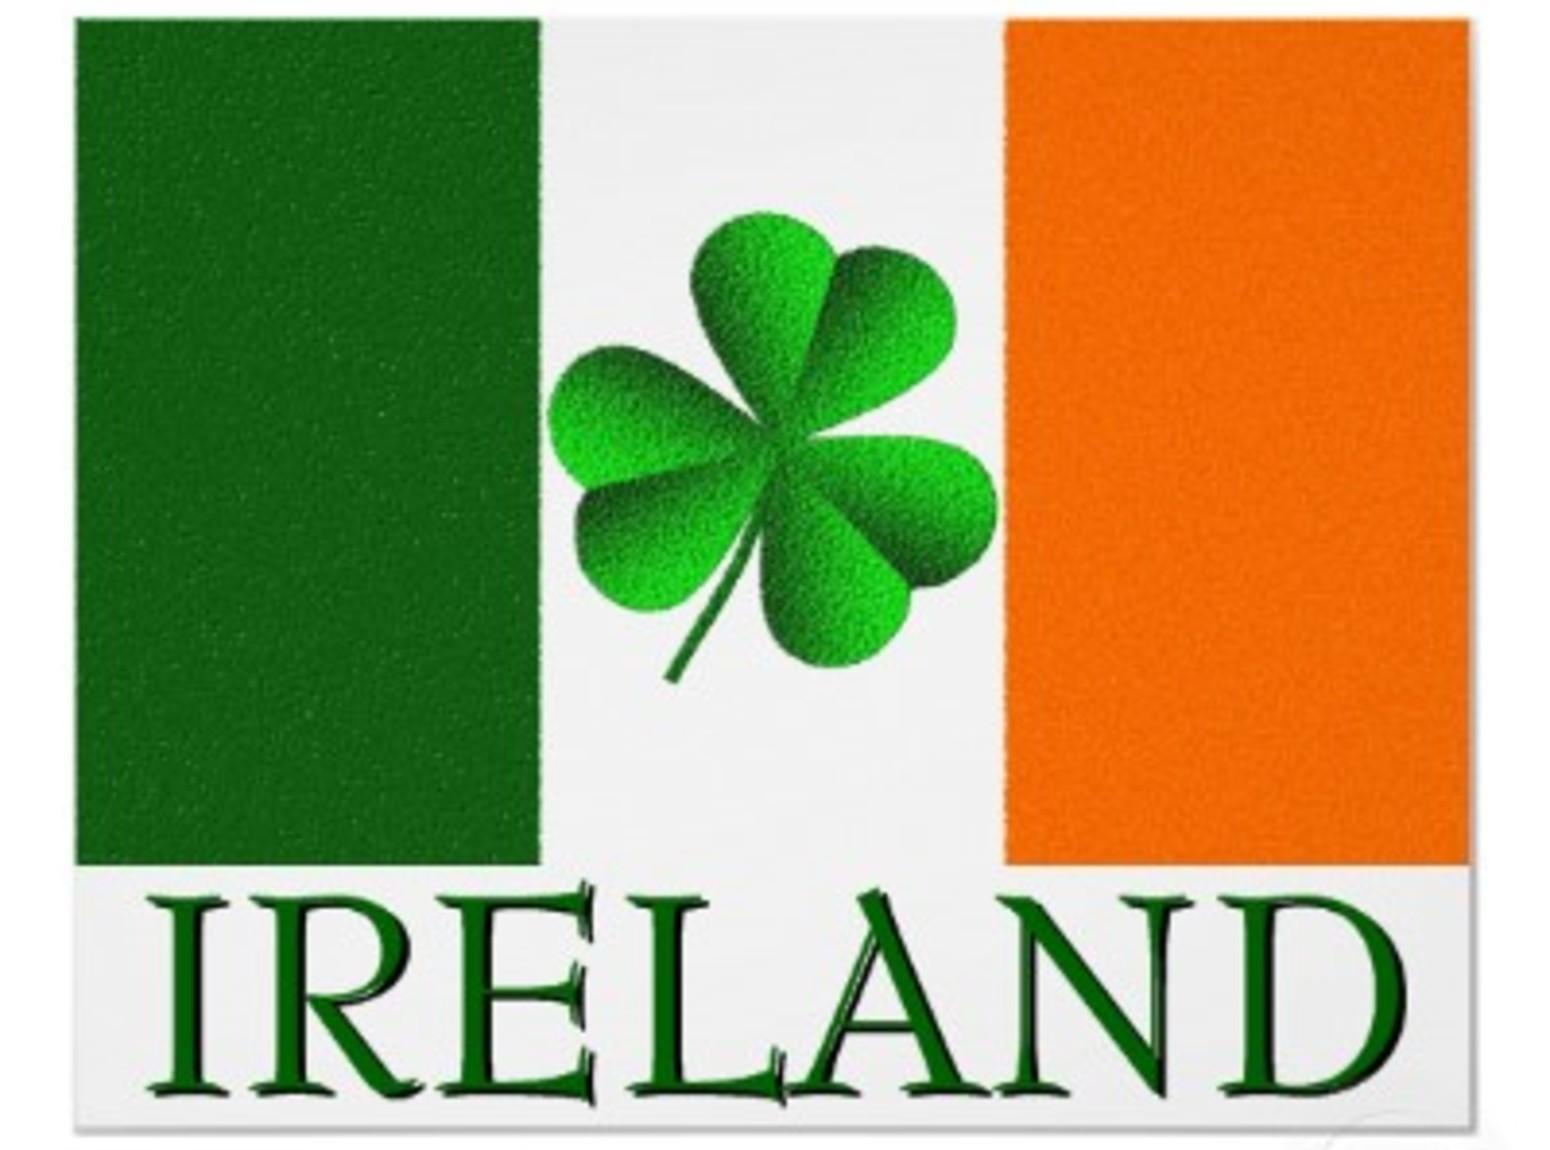 Irish Flag Download Clip Art Clip Art on Clipart 1550x1150